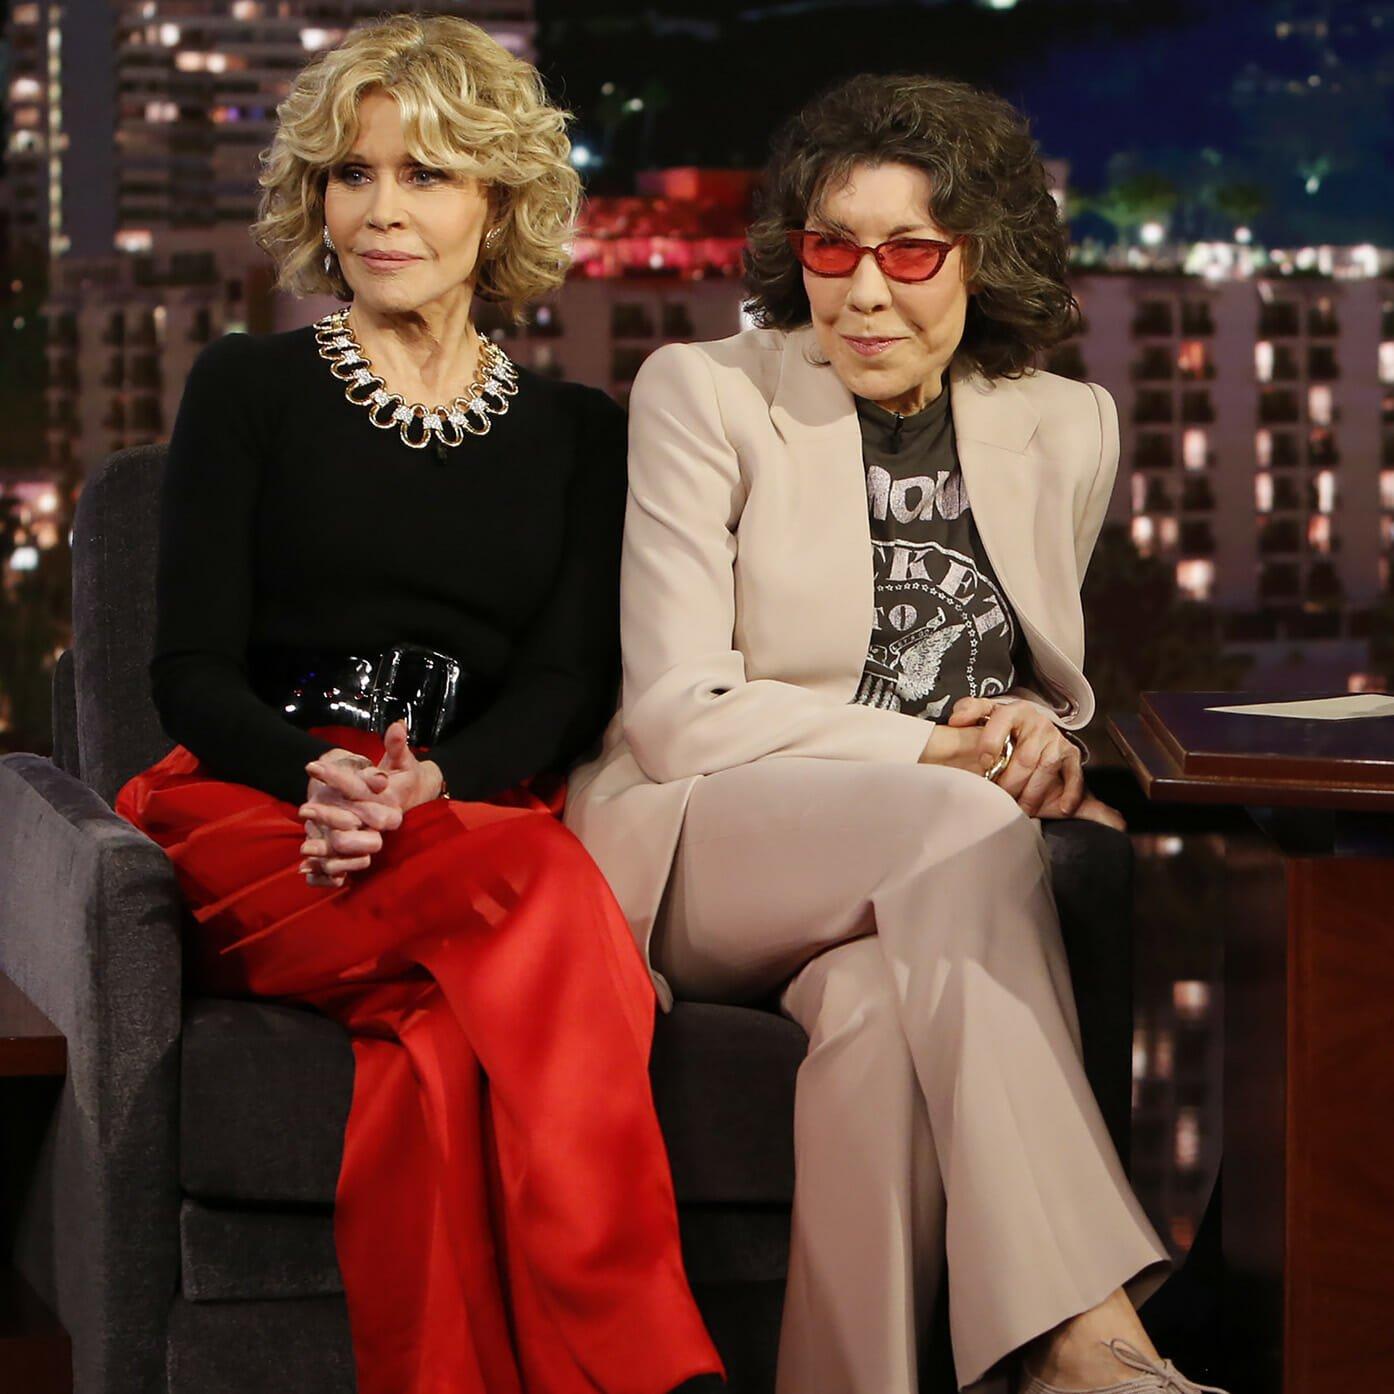 Celeb-Lewk-of-the-Week-Lily-Tomlin-Jane-Fonda-Jimmy-Kimmel-ABC-Man-Repeller-April-2019151240_2599-copy.jpg